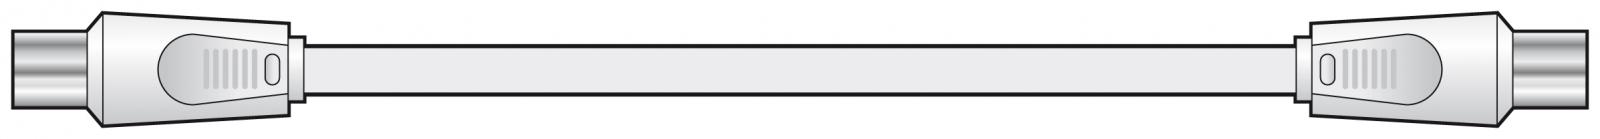 AV:link Coaxial Plug to Plug 1.0m 112.002UK